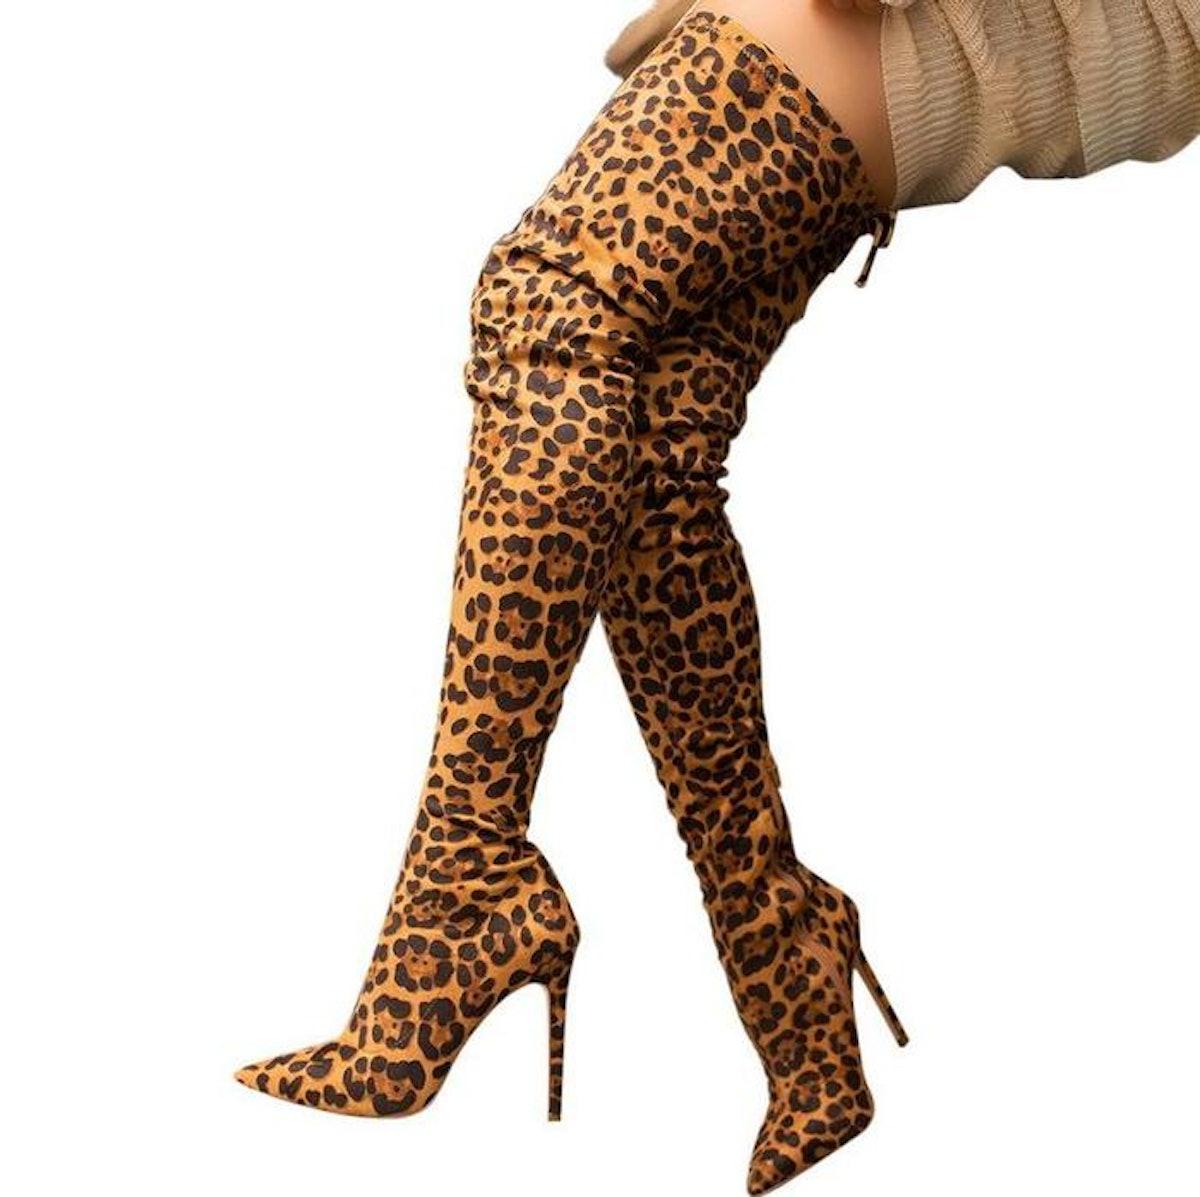 Women's Sexy Leopard Stiletto High Heel Thigh High Boots